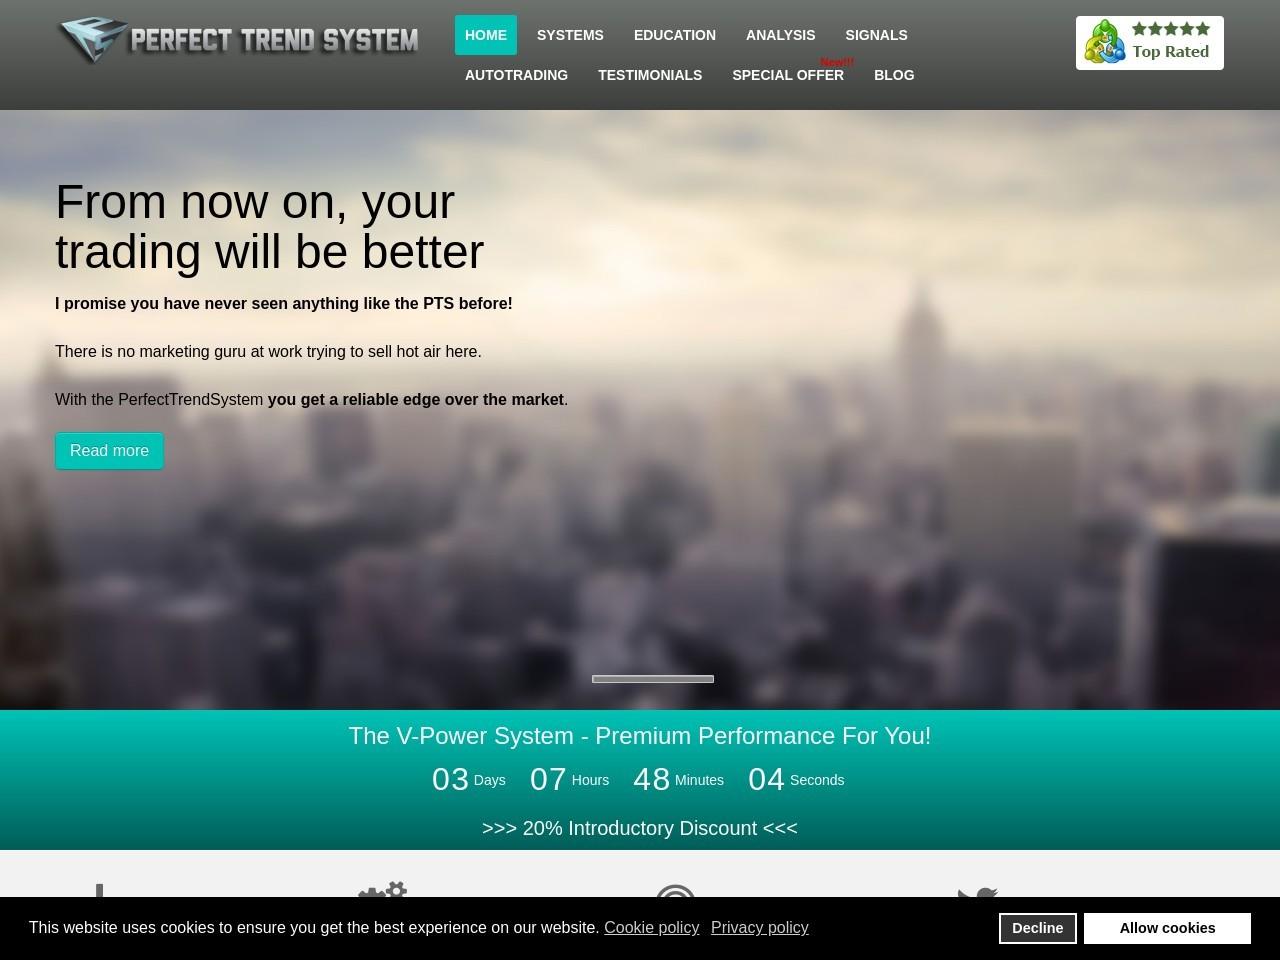 PerfectTrendSystem